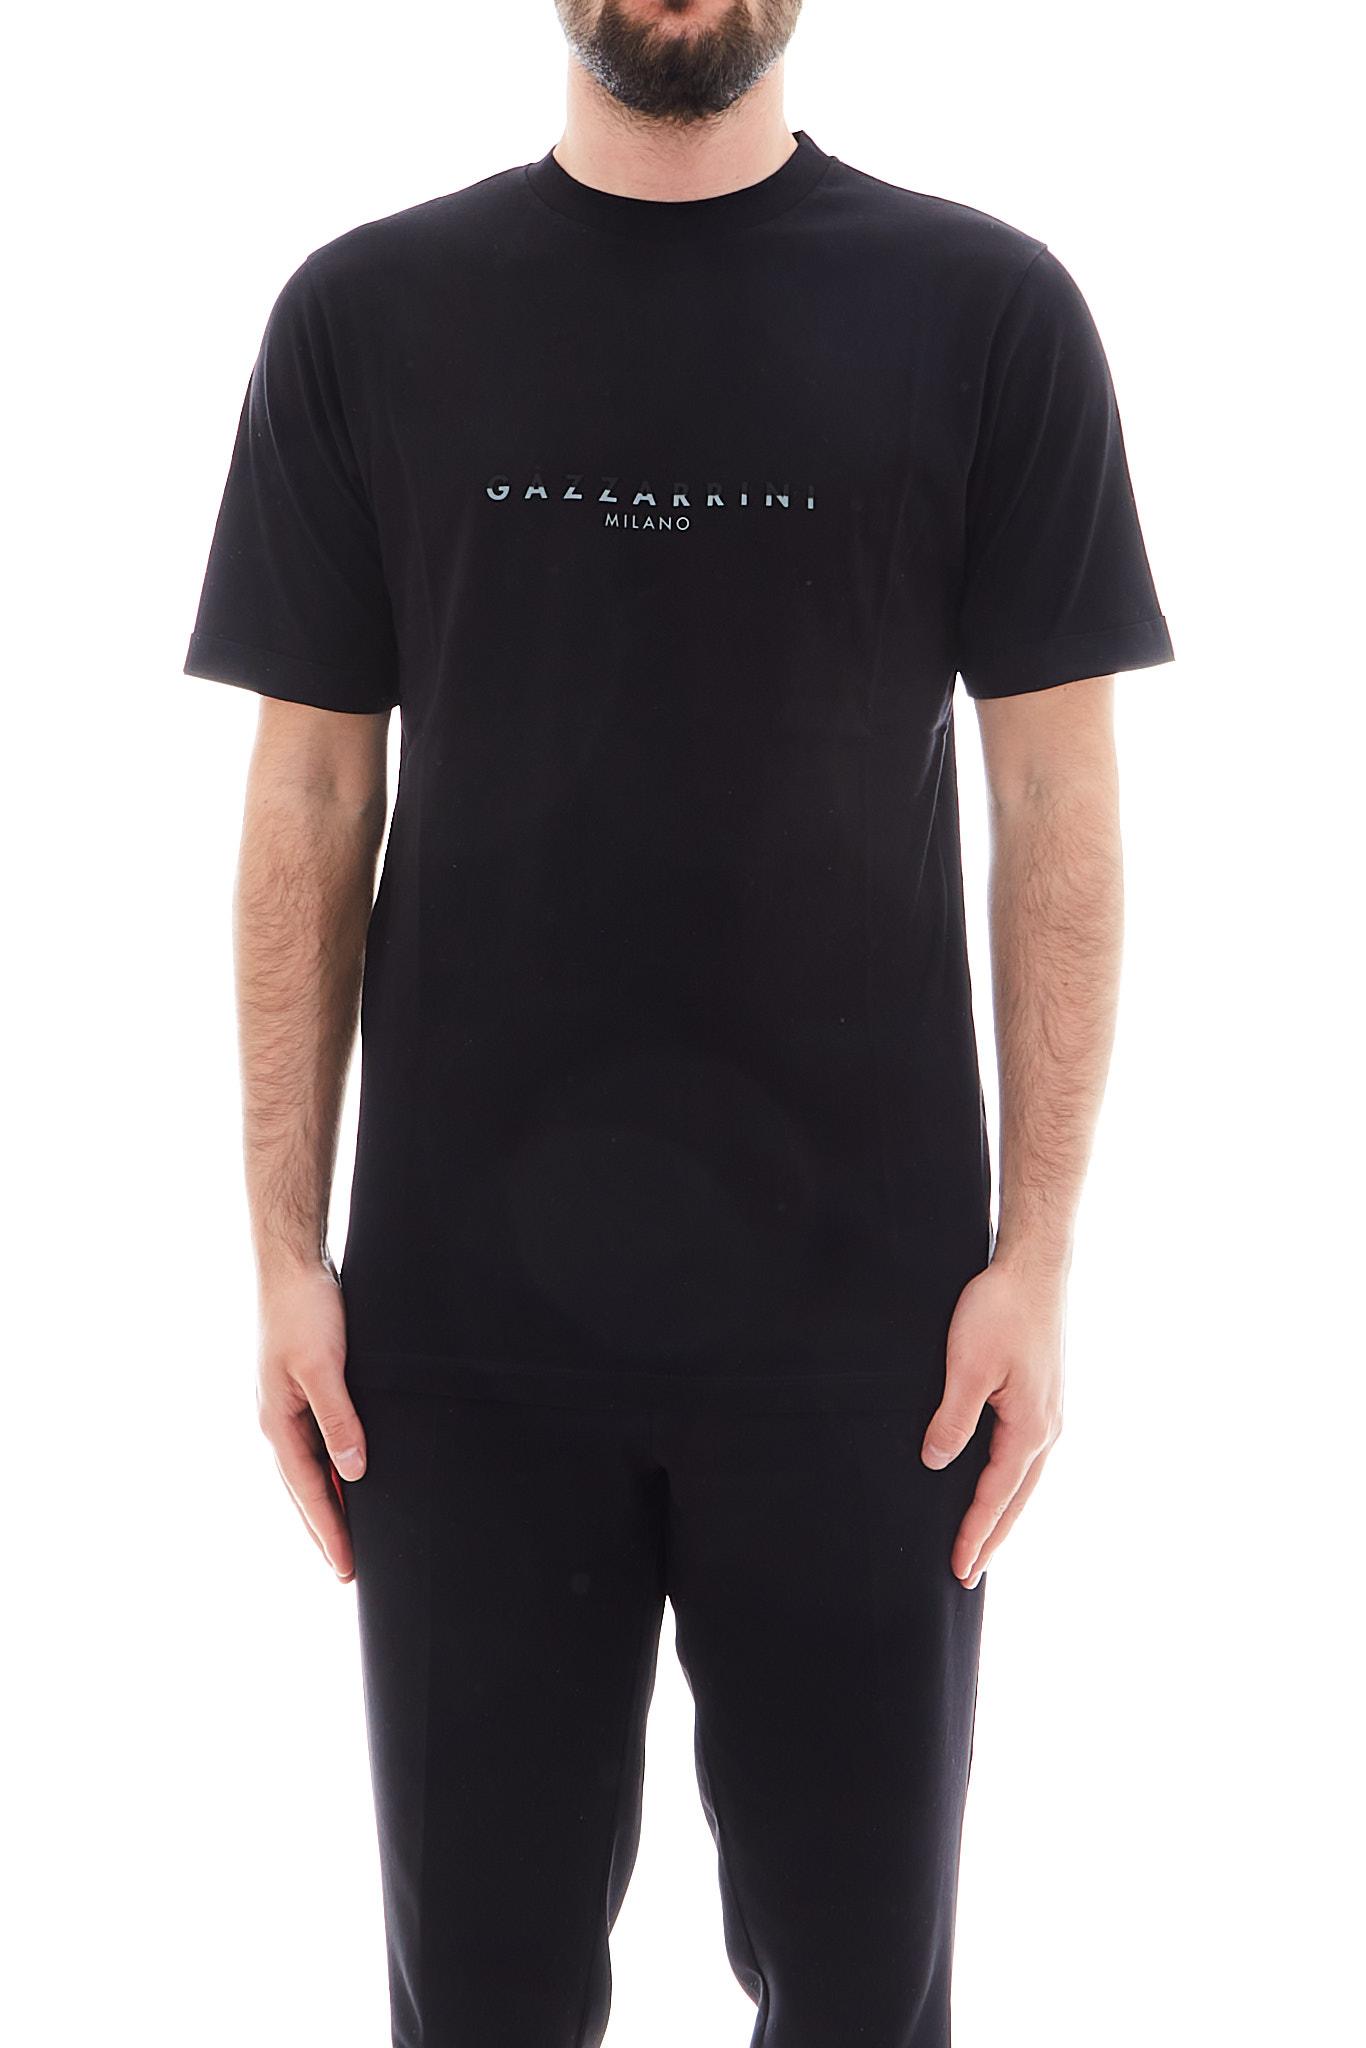 T-shirt Gazzarrini GAZZARRINI | T-shirt | TE15GNERO